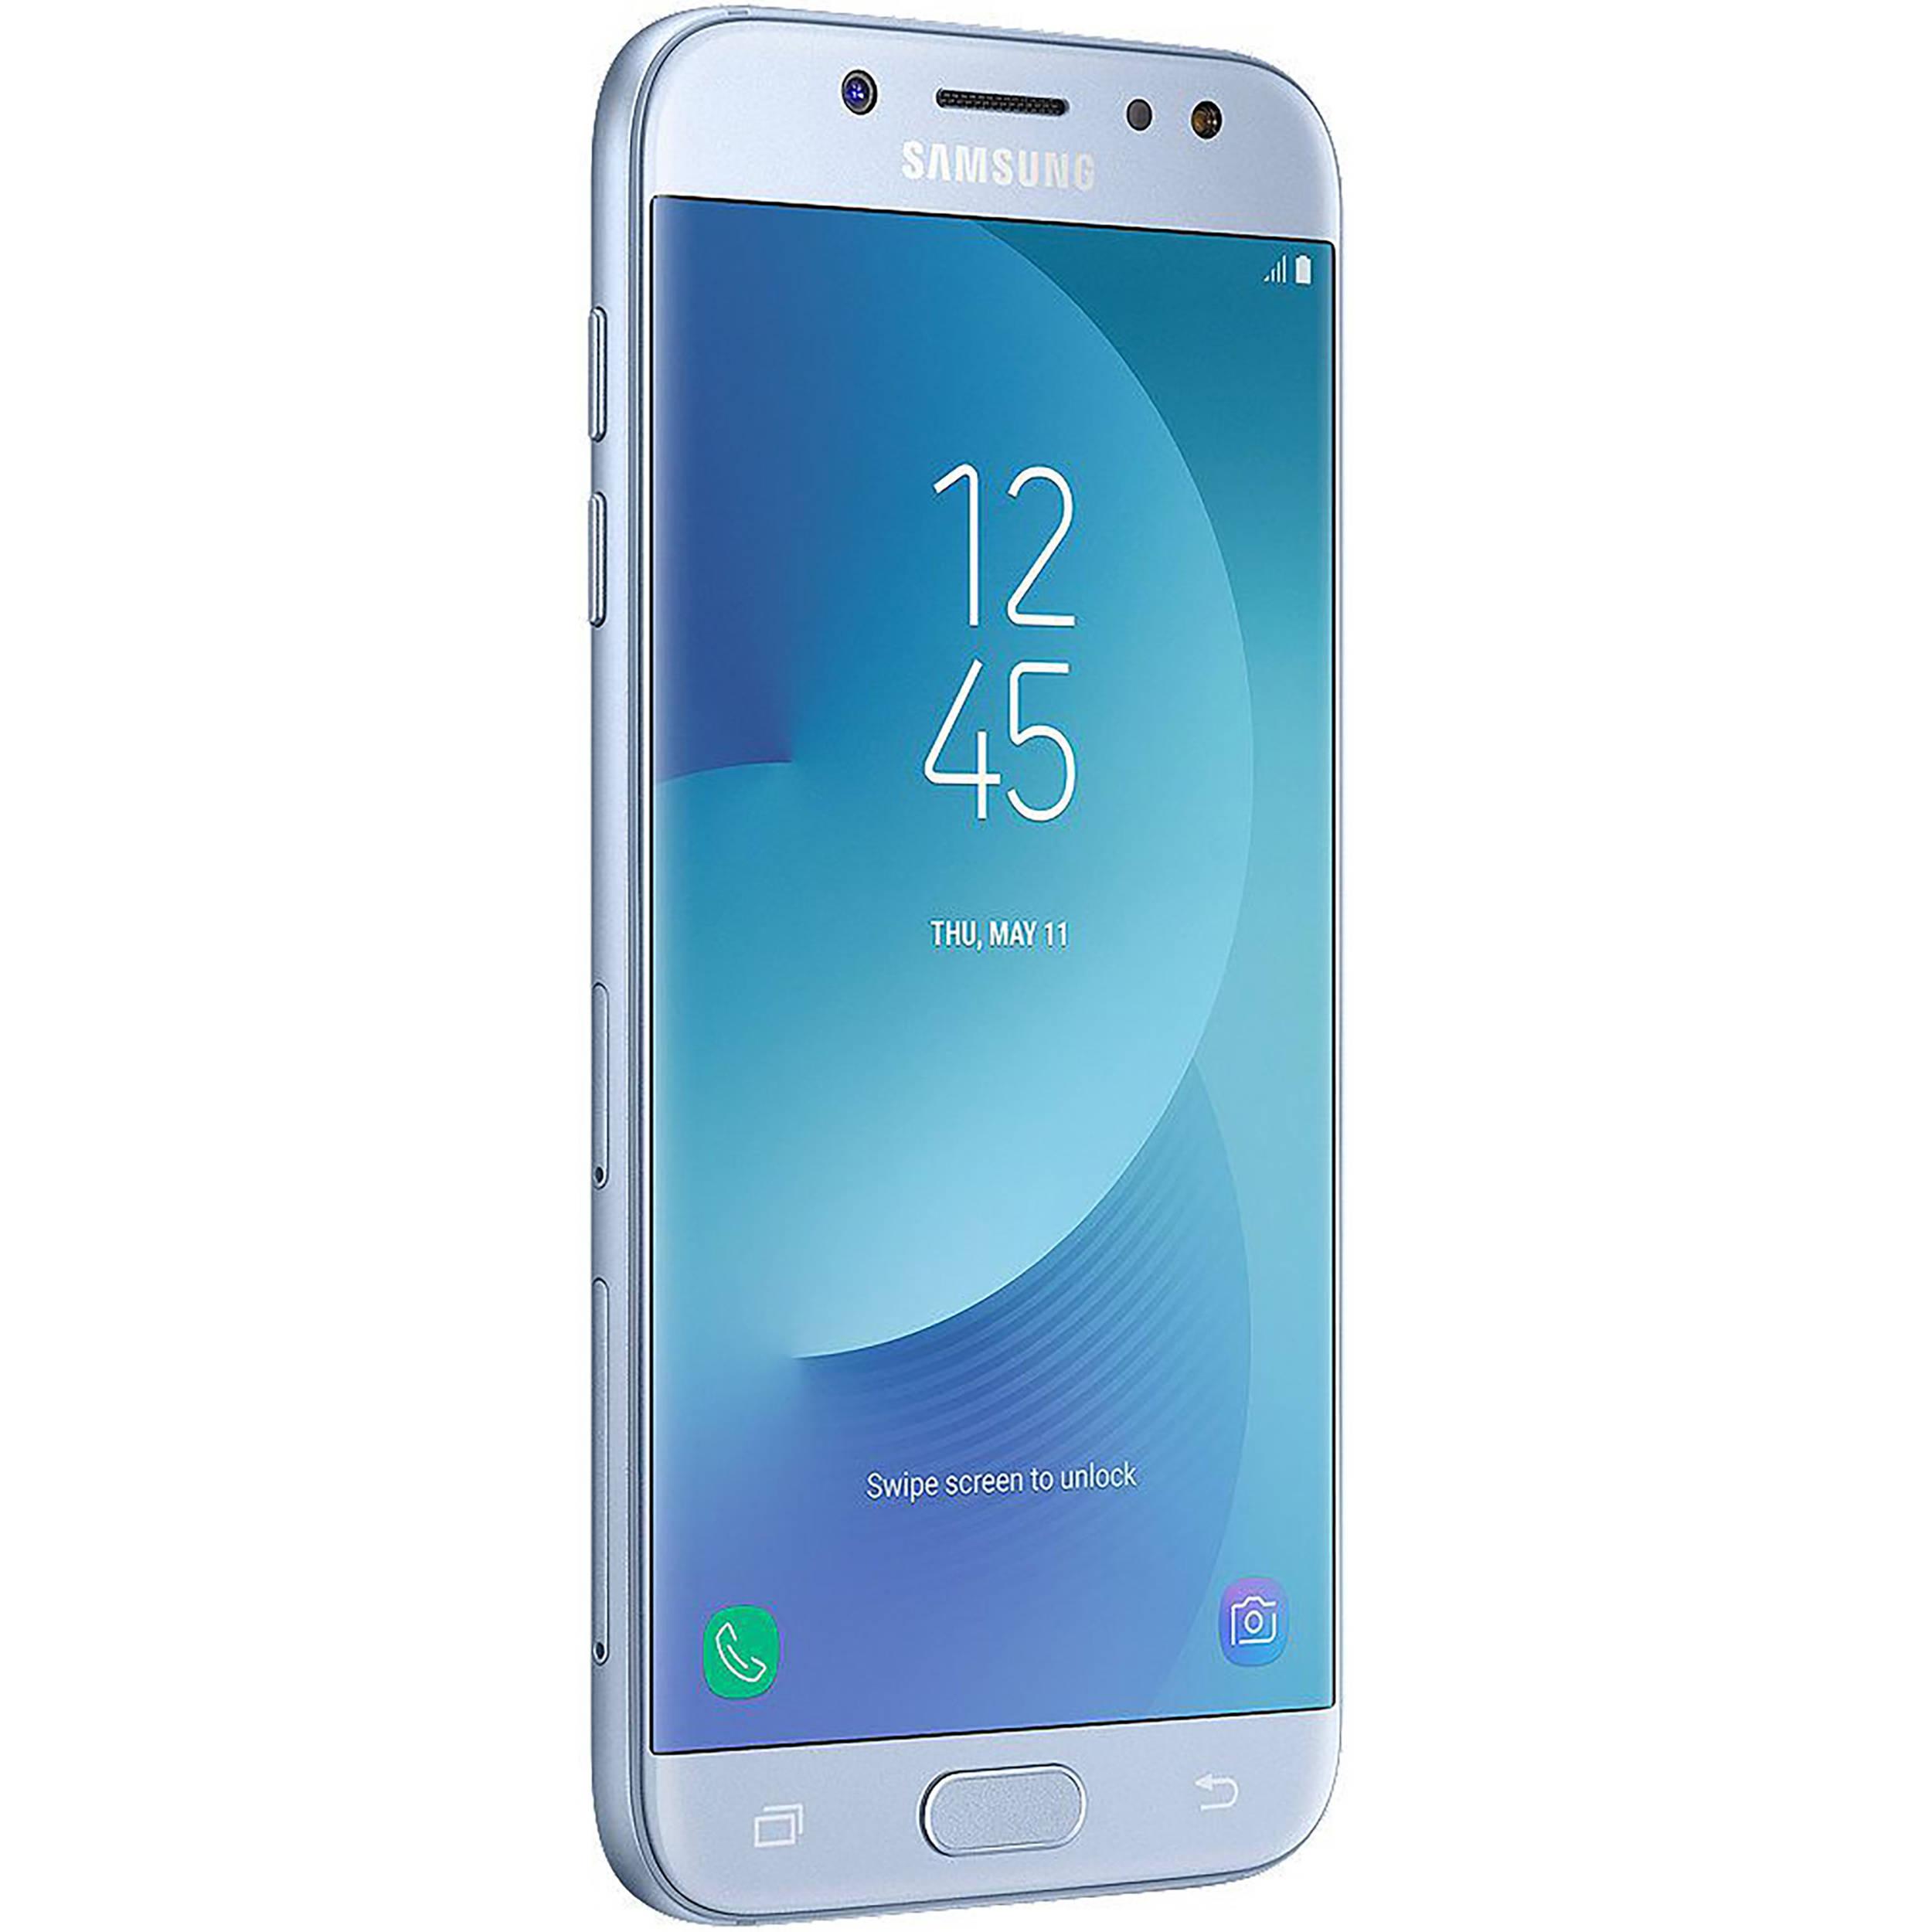 Samsung Galaxy J5 Pro SM J530G 16GB Smartphone Region Specific Unlocked Blue Silver